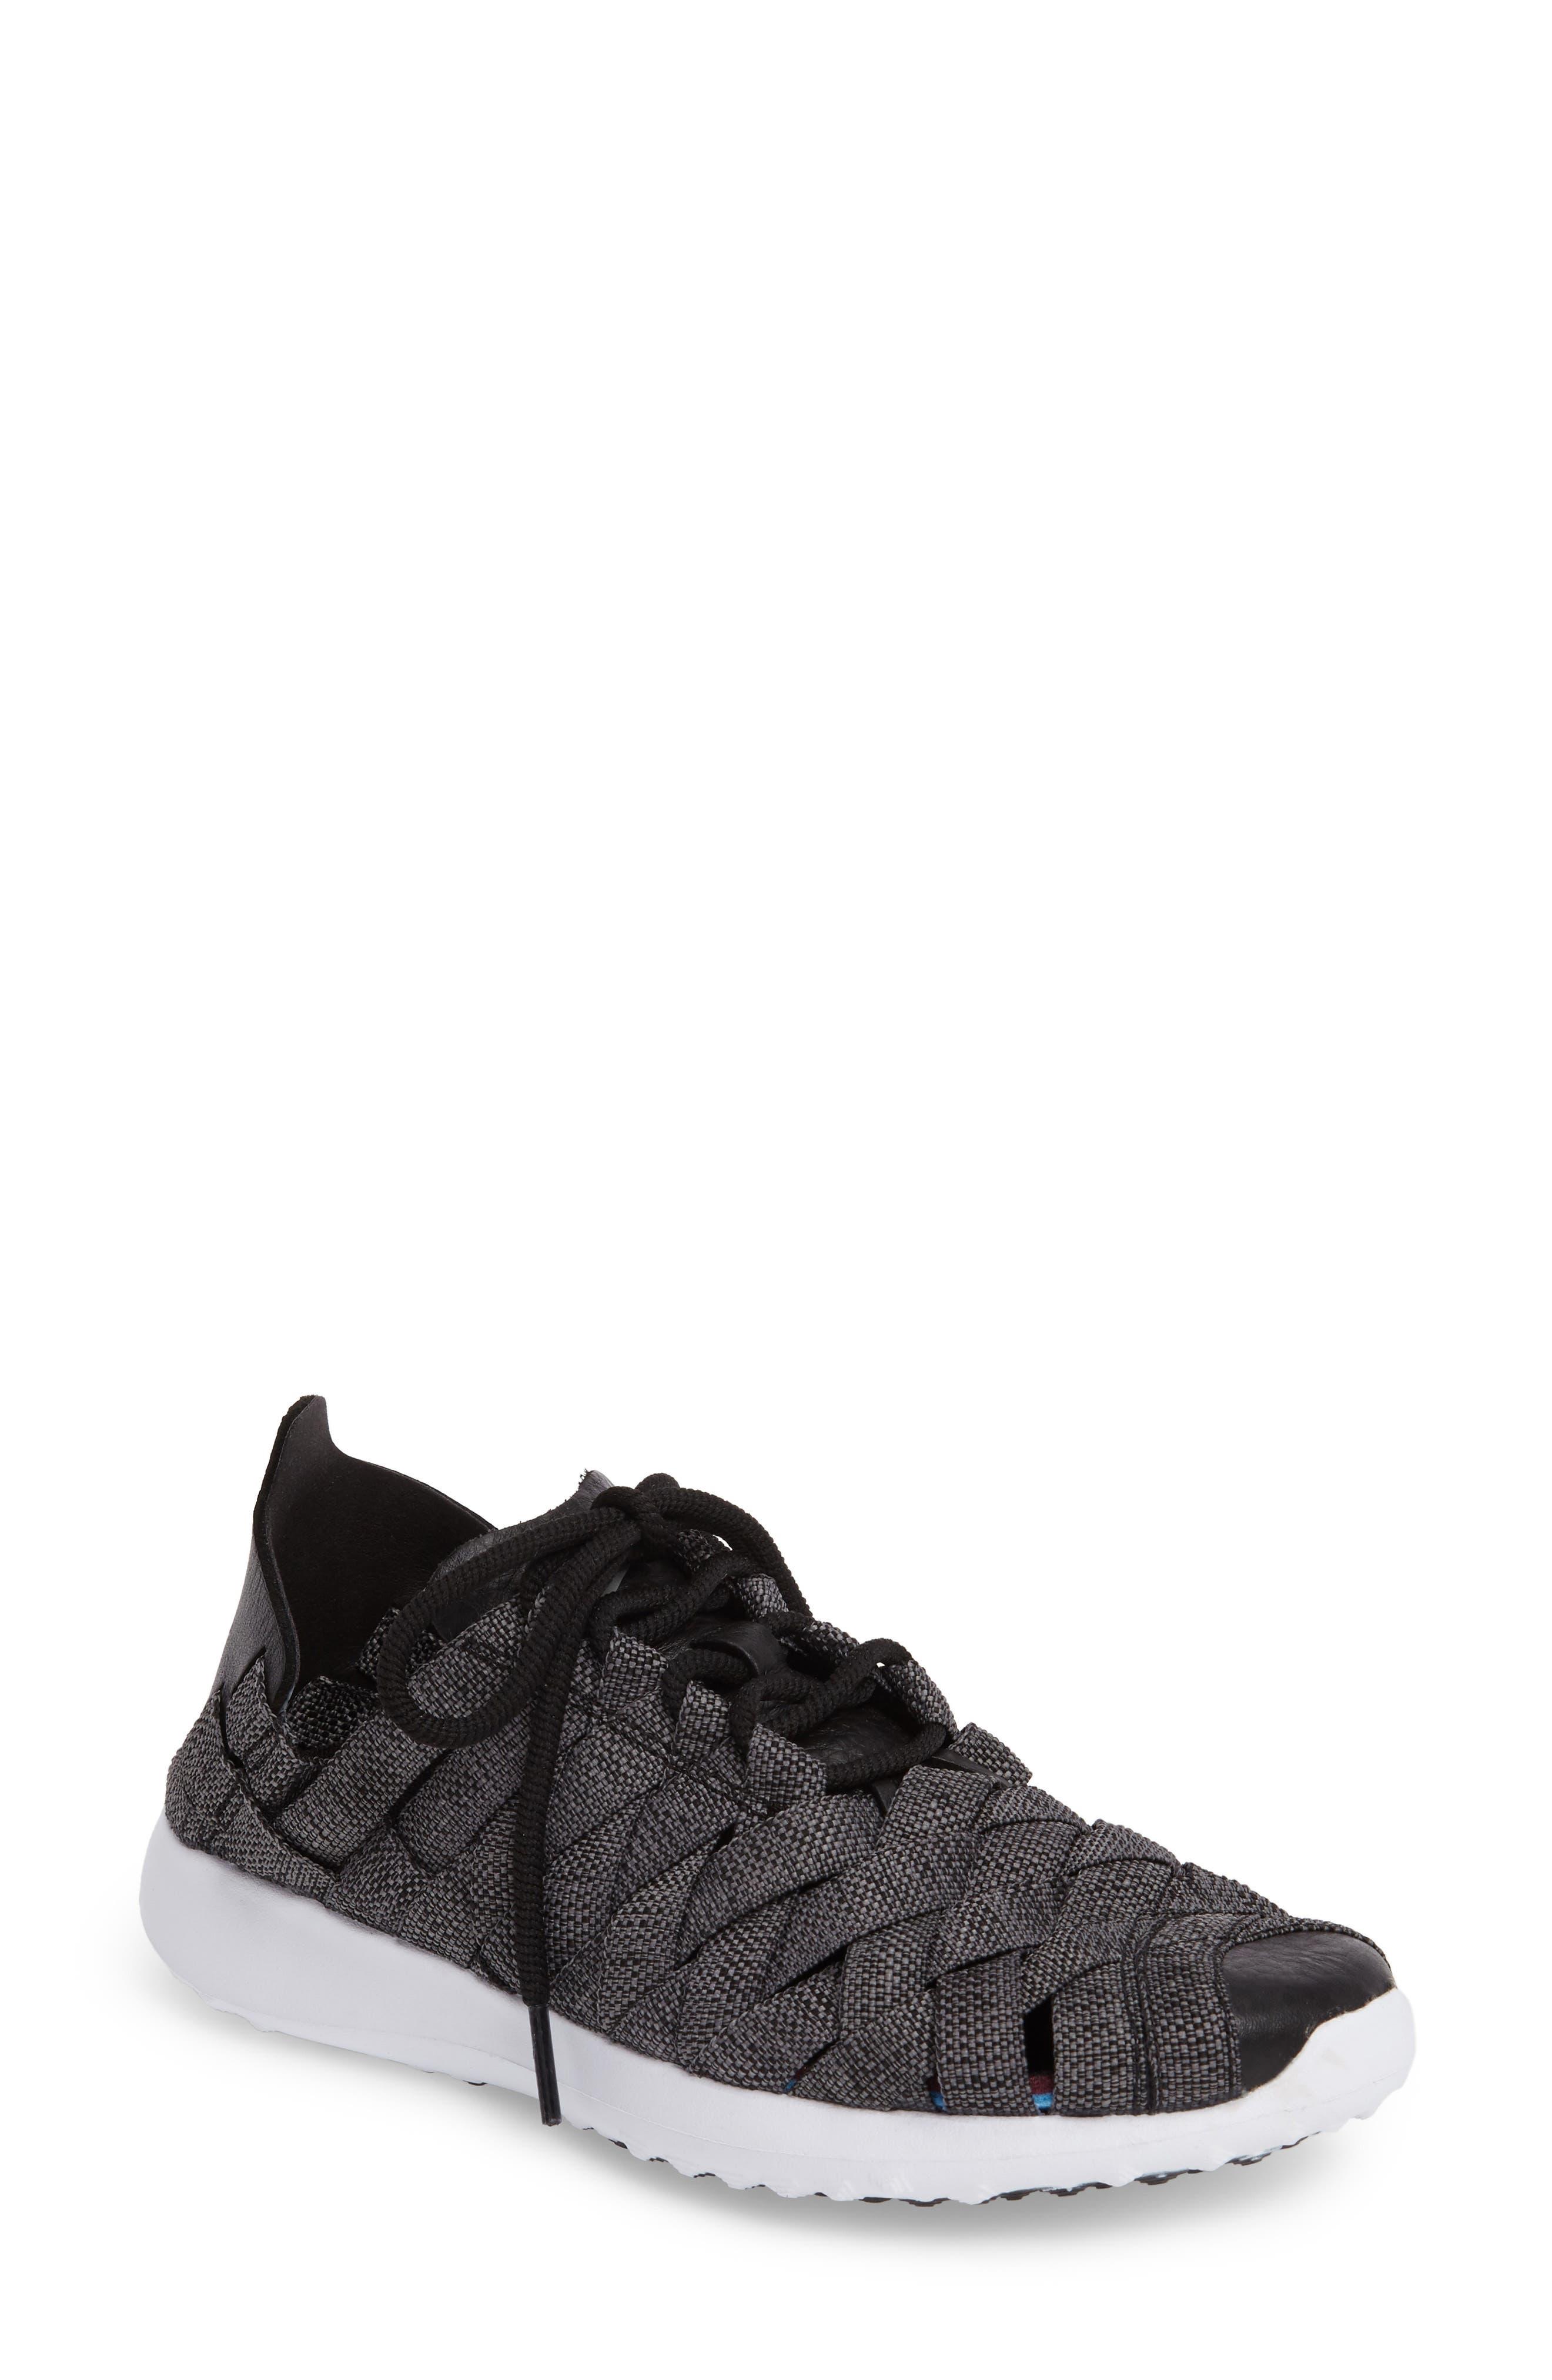 'Juvenate - Woven' Sneaker,                             Main thumbnail 1, color,                             Black/ Cool Grey/ White